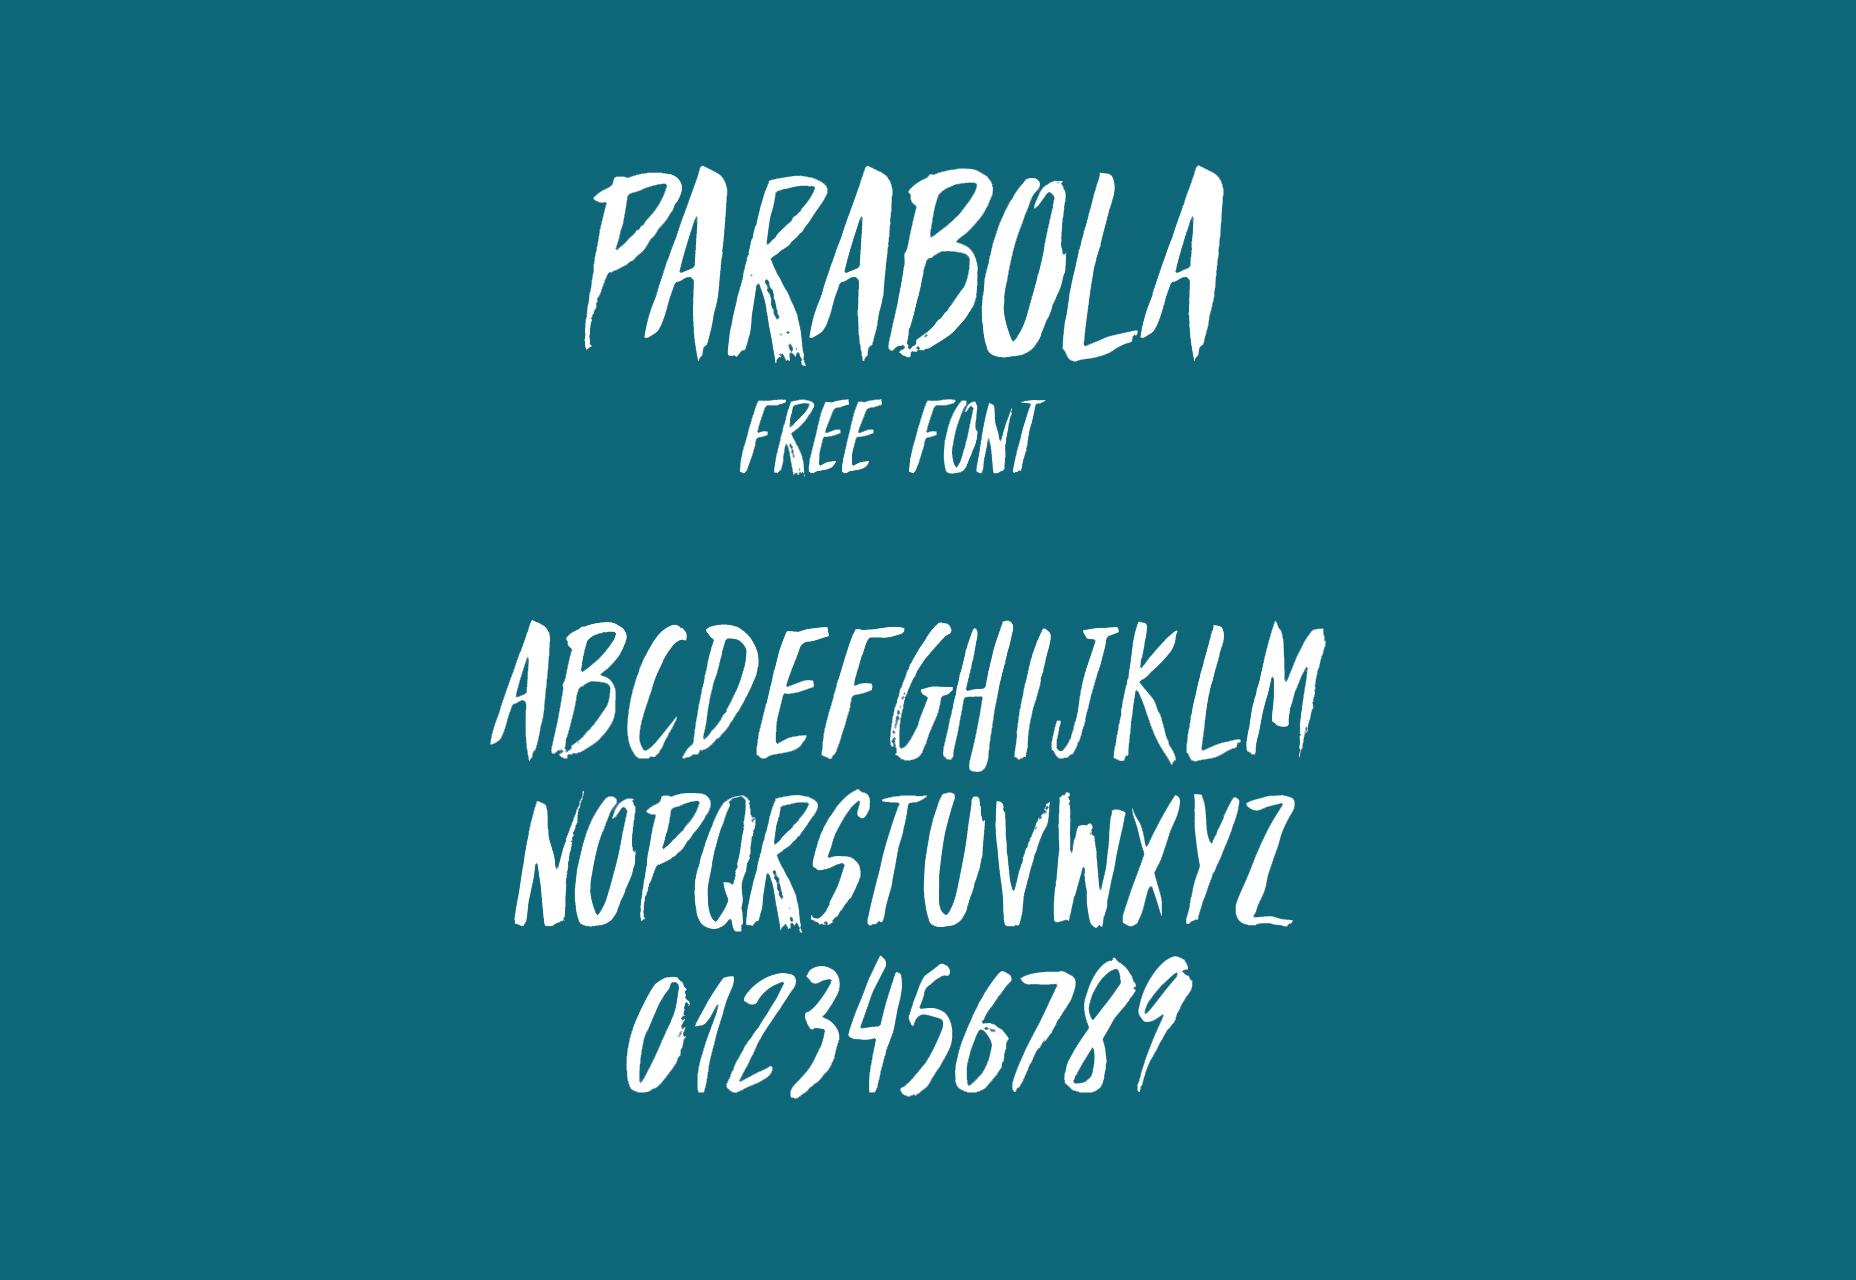 Parabola: Brush Hand-written Style Font